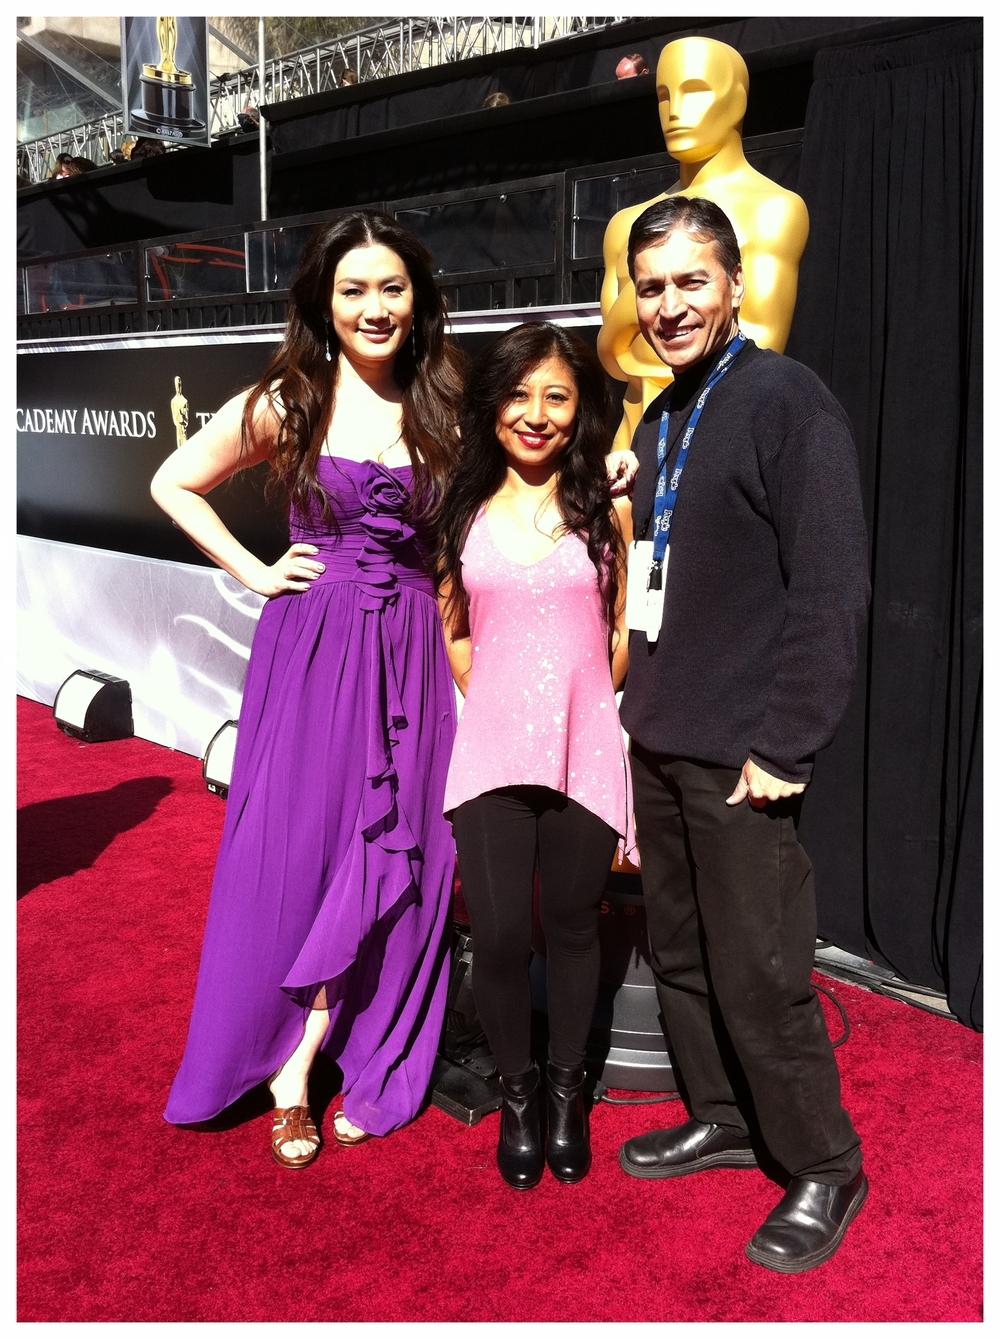 Academy Awards w/Armando V. & LA18 Reporter Kelly C.